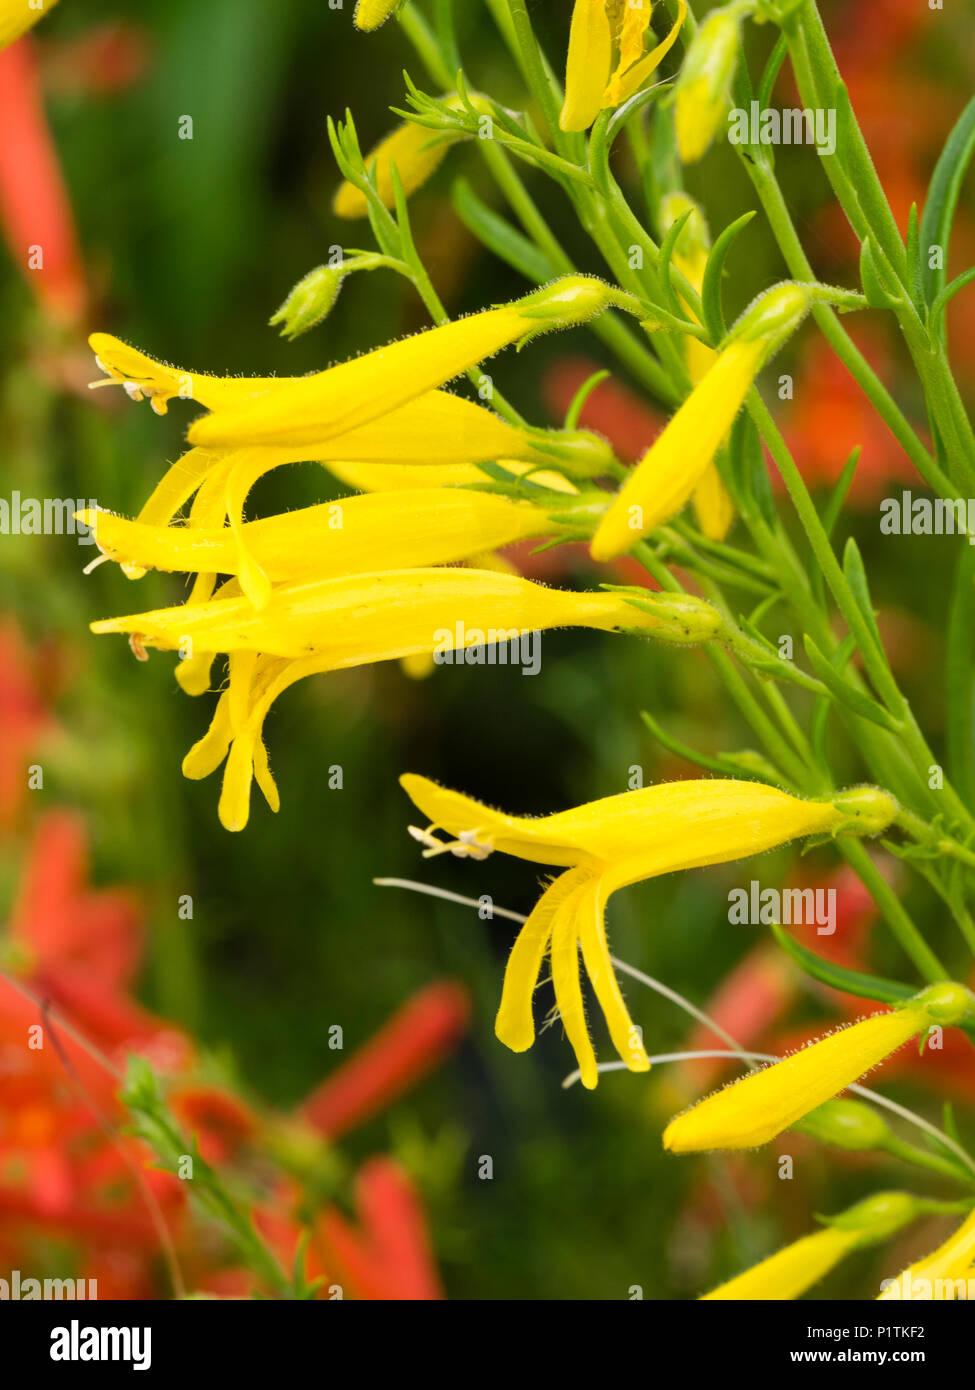 yellow flowering shrub stockfotos yellow flowering shrub. Black Bedroom Furniture Sets. Home Design Ideas